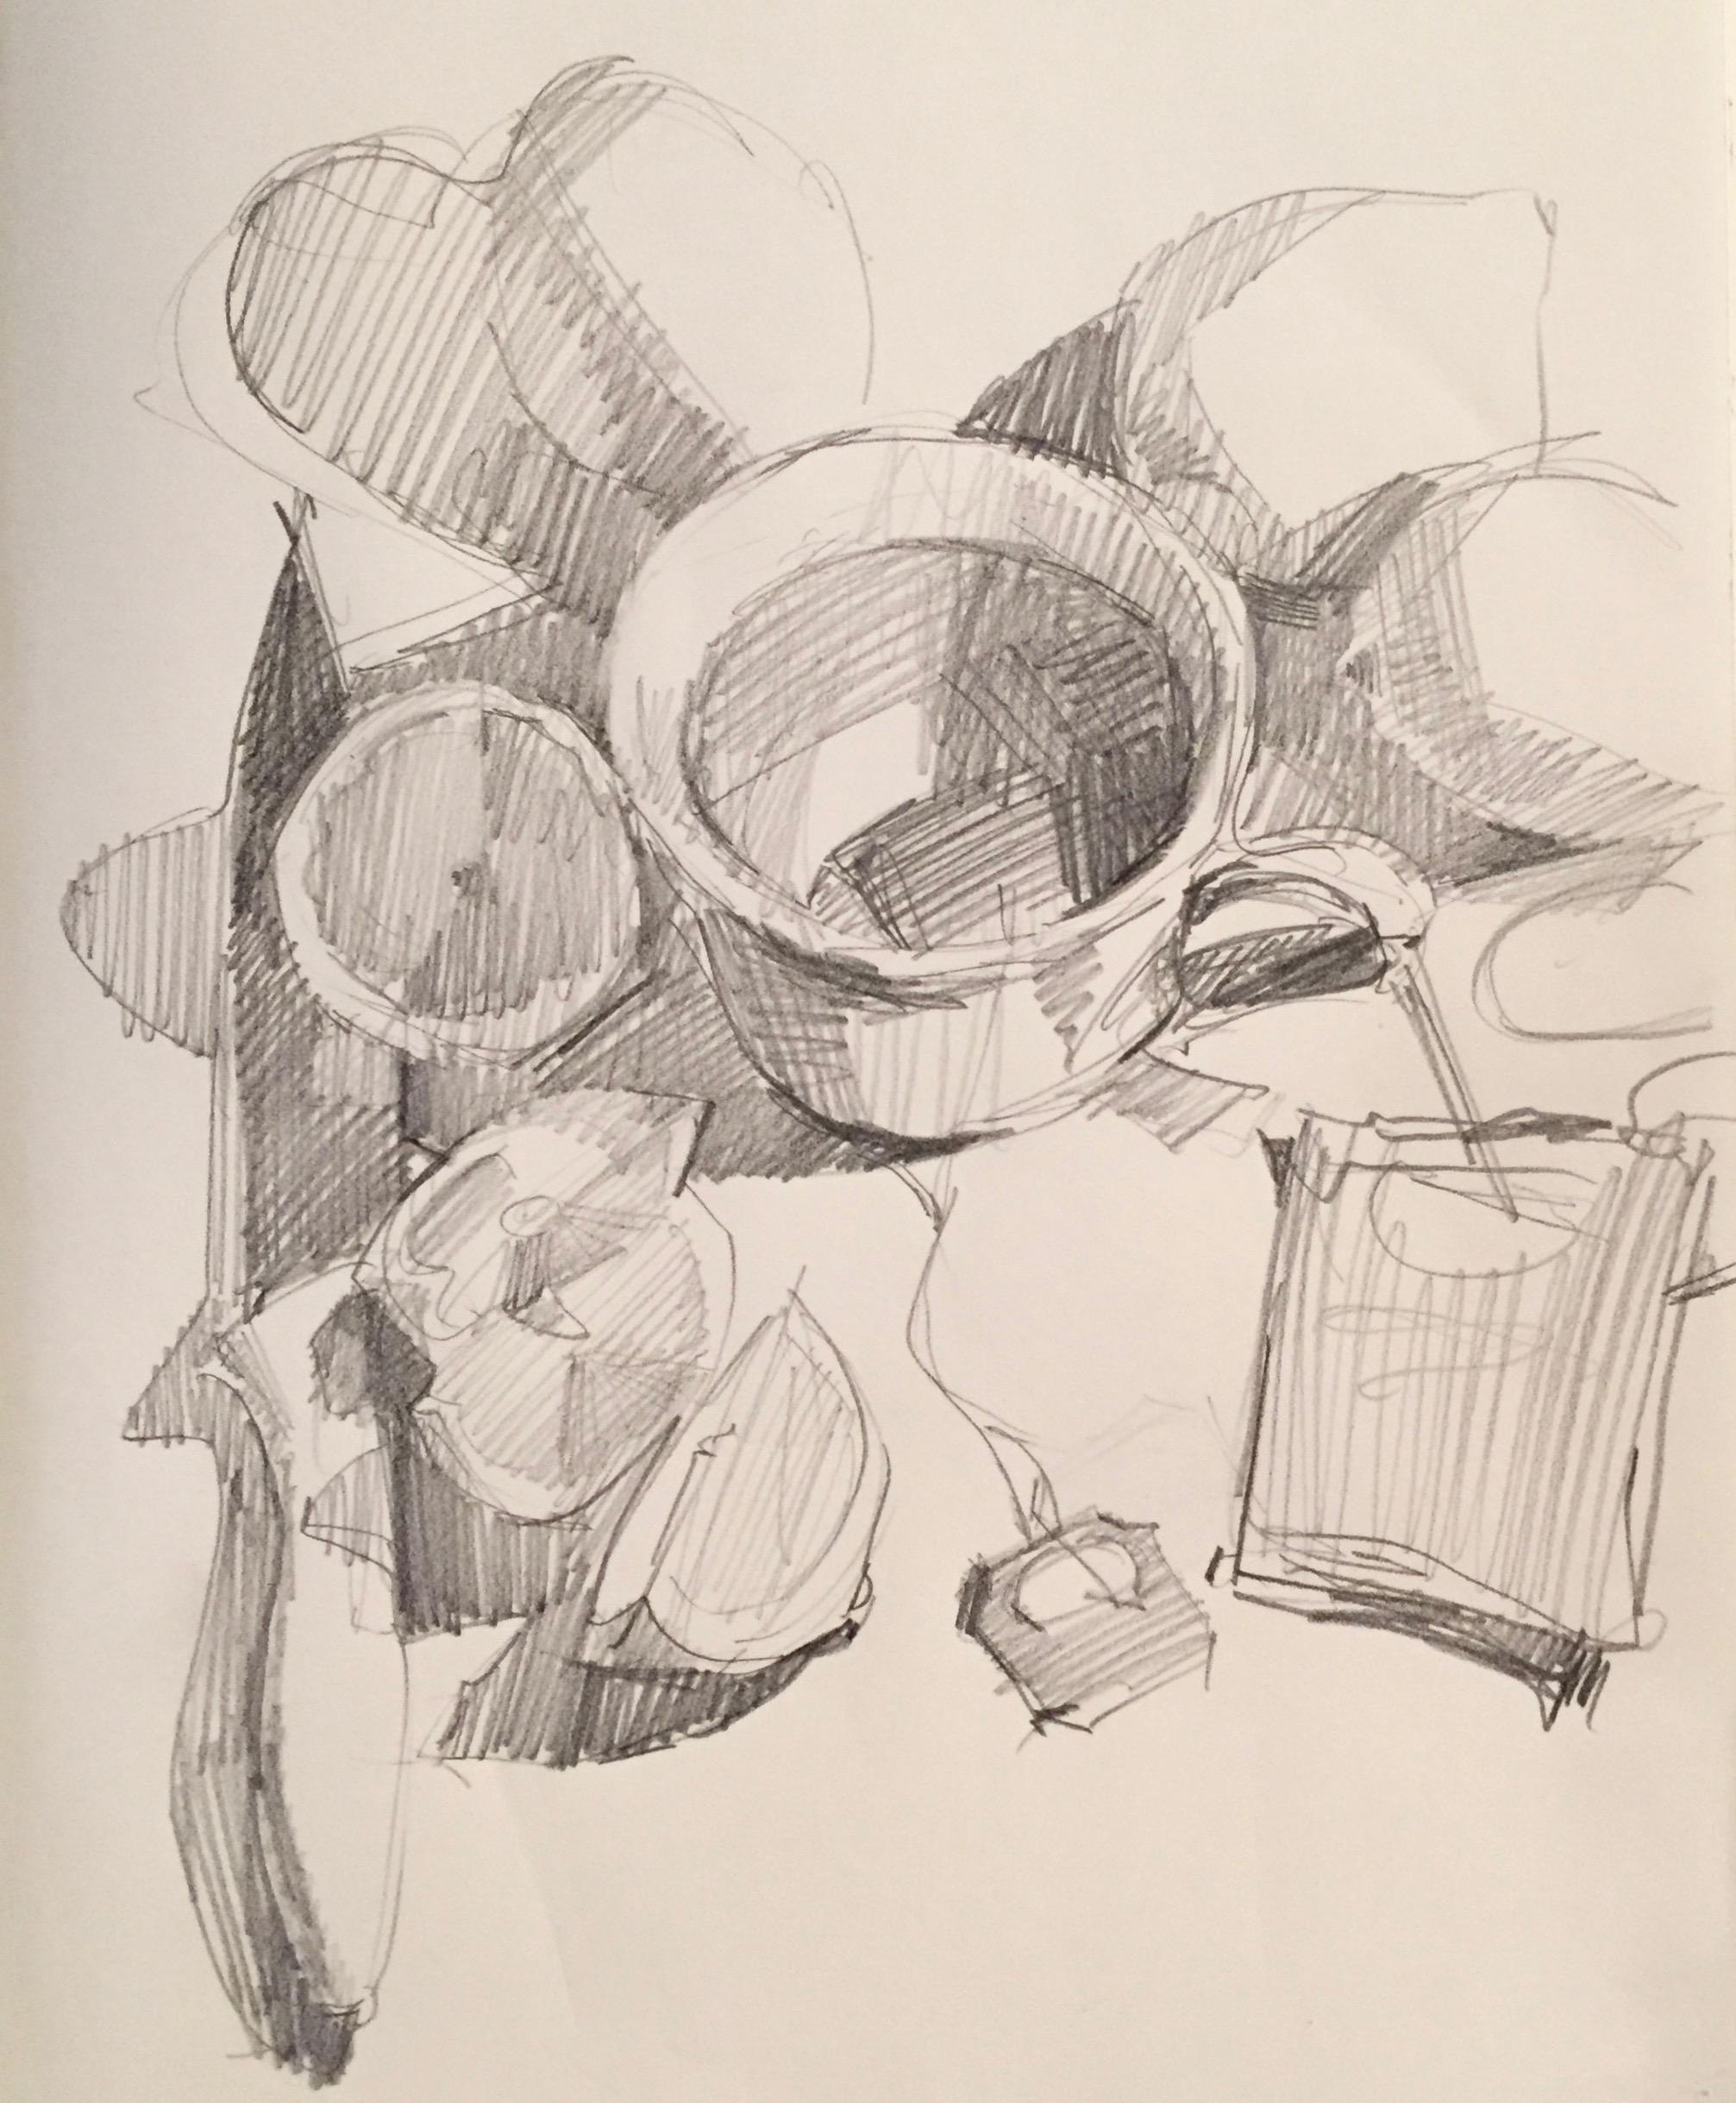 2013x2438 Sketchbook By Sarah Sedwick. 3.3.16.